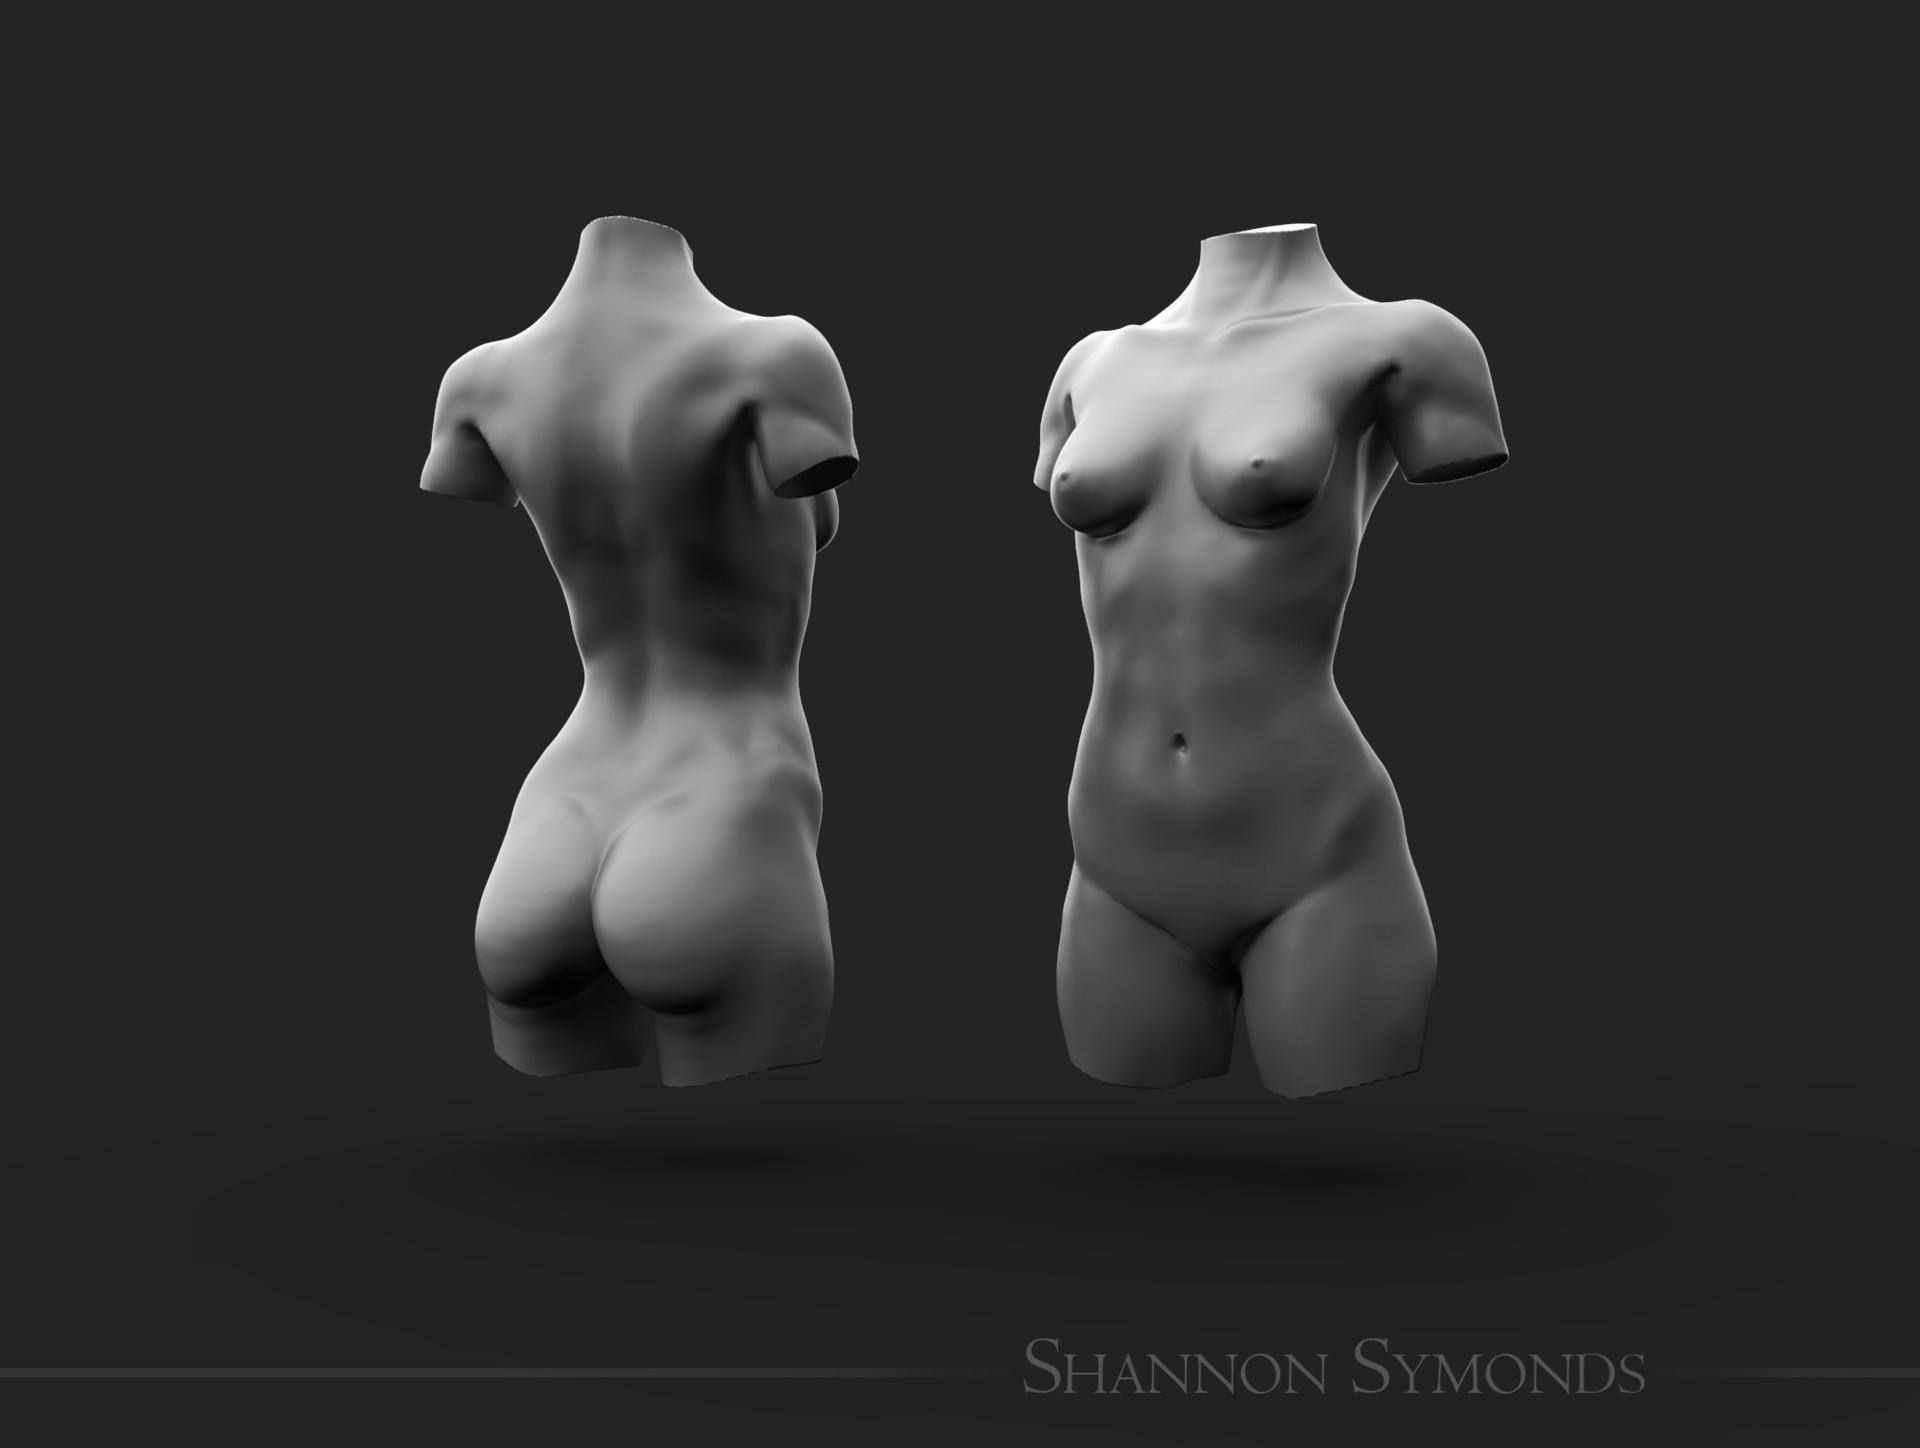 Shannon symonds female unposed